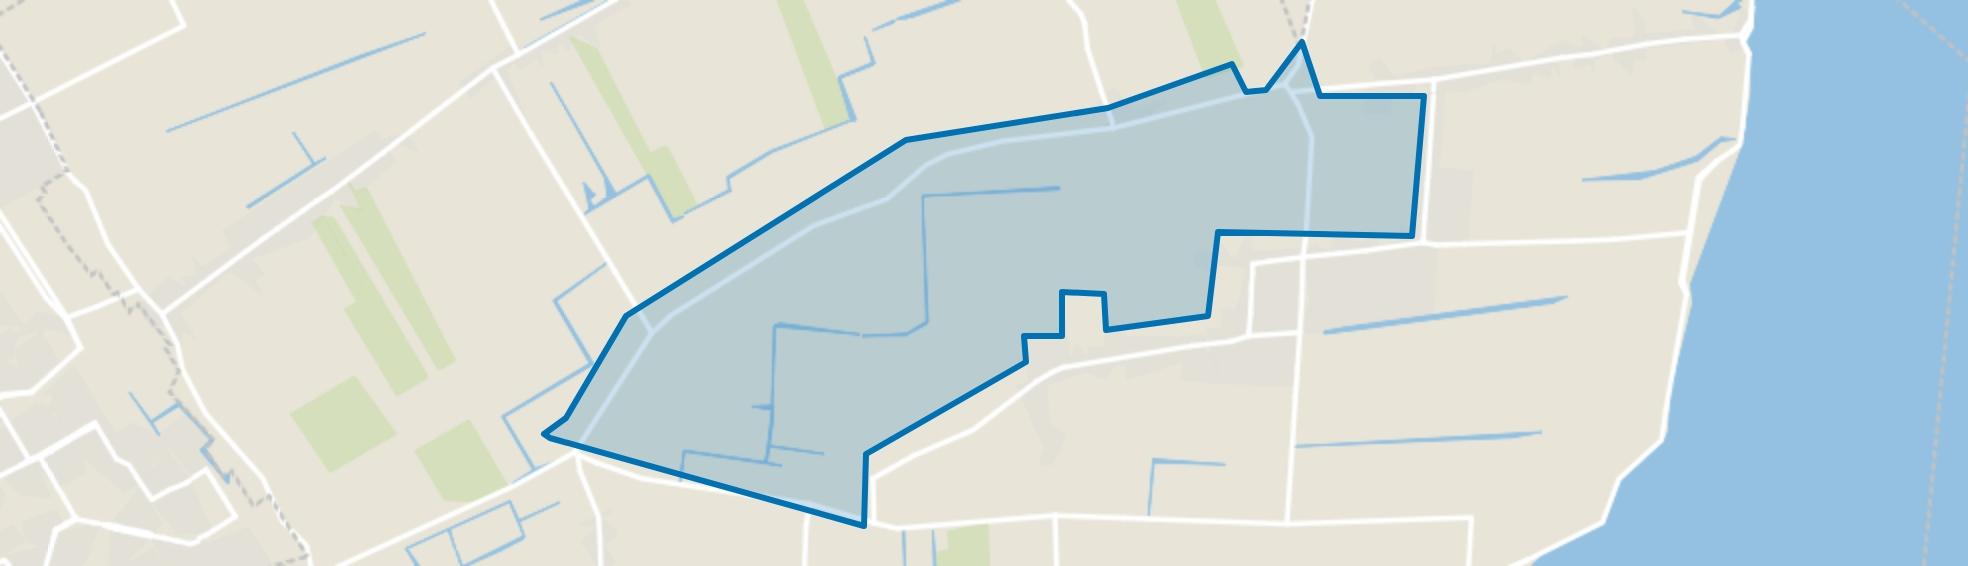 De Hout en Blokdijk, Hem map